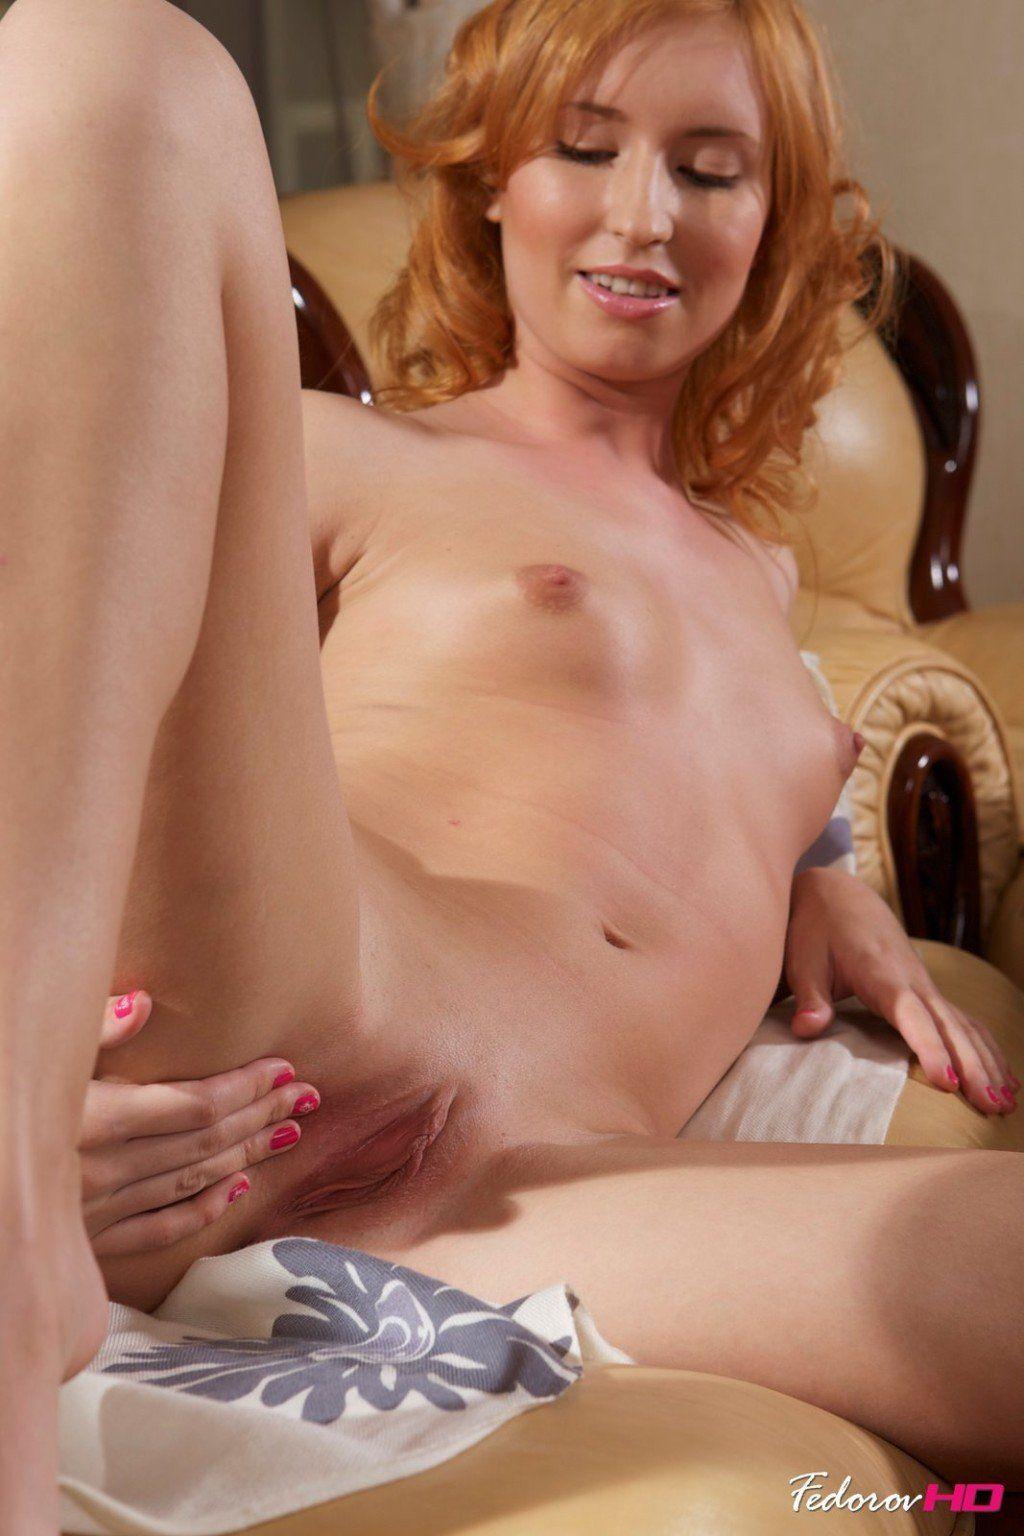 Chloe amour jessa rhodes nude